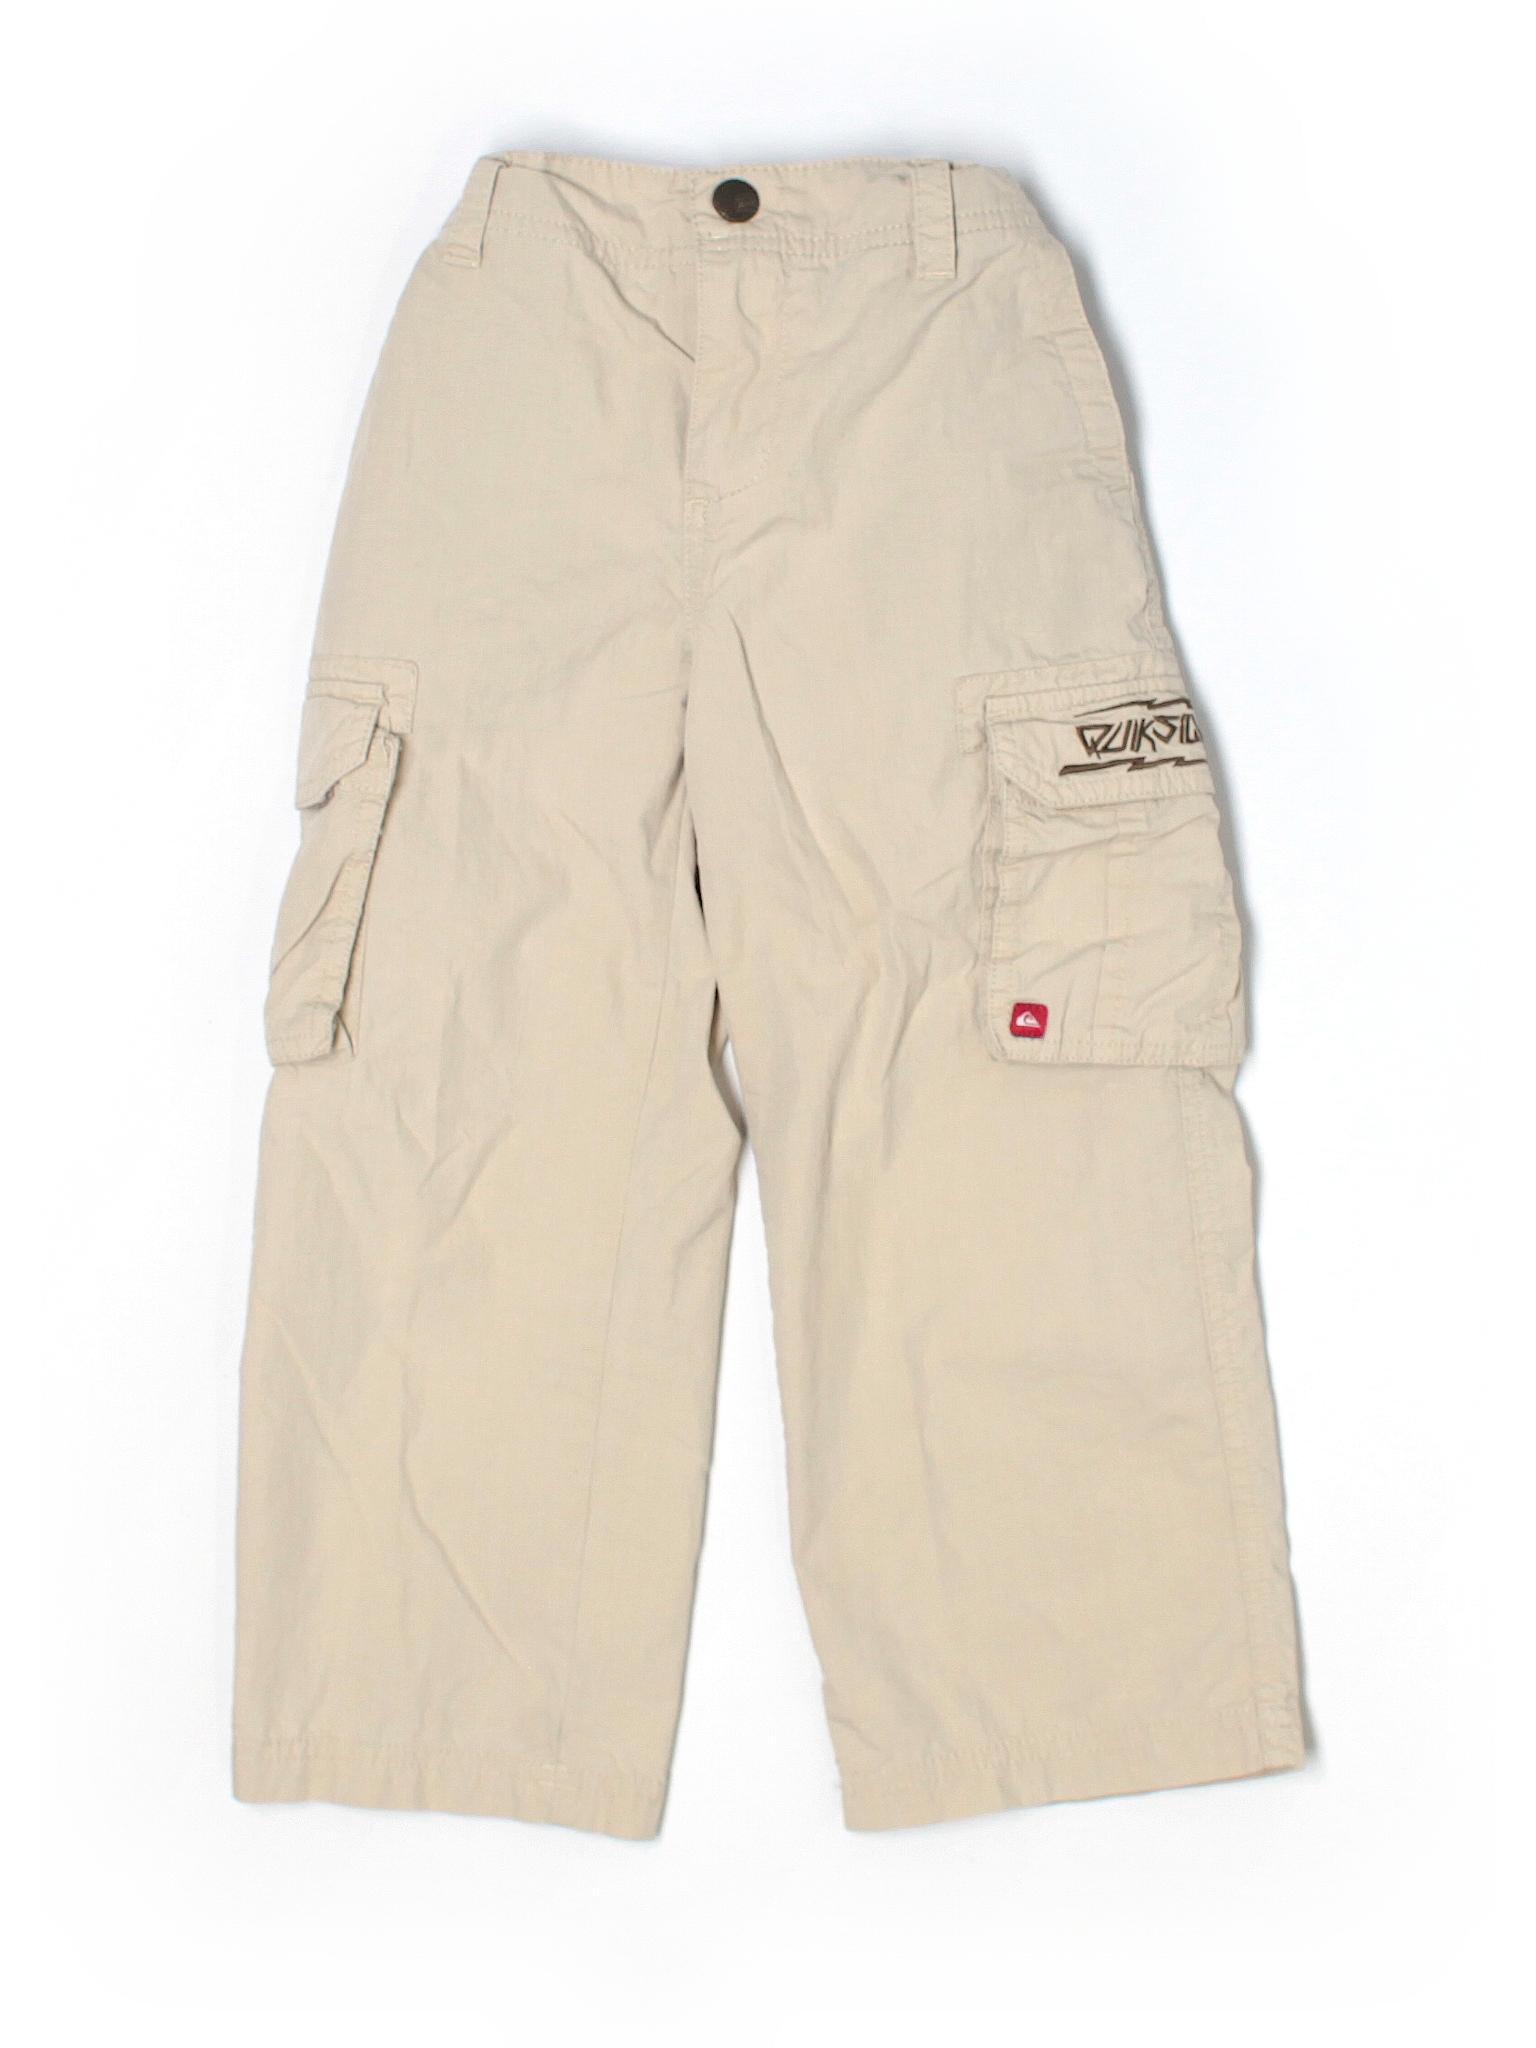 Quiksilver cargo pants 97 off only on thredup for Bureau quiksilver